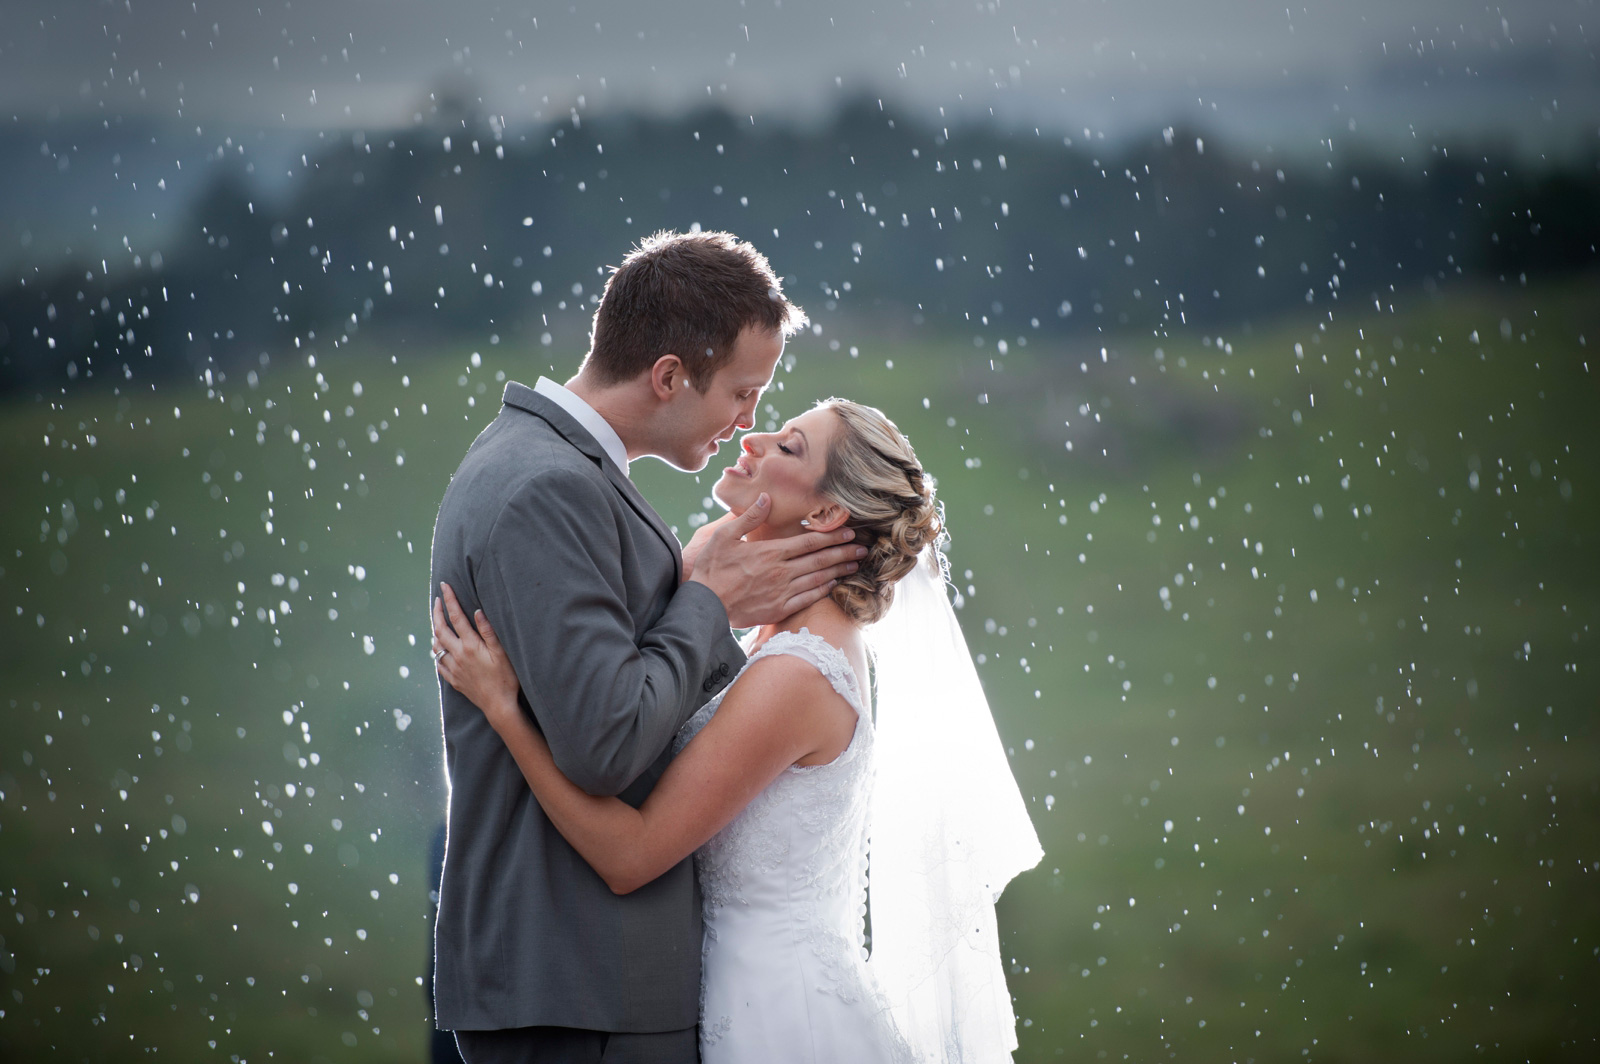 Netherwood-Wedding-Top-South-African-Creative-Wedding-Photographer-Jacki-Bruniquel-001